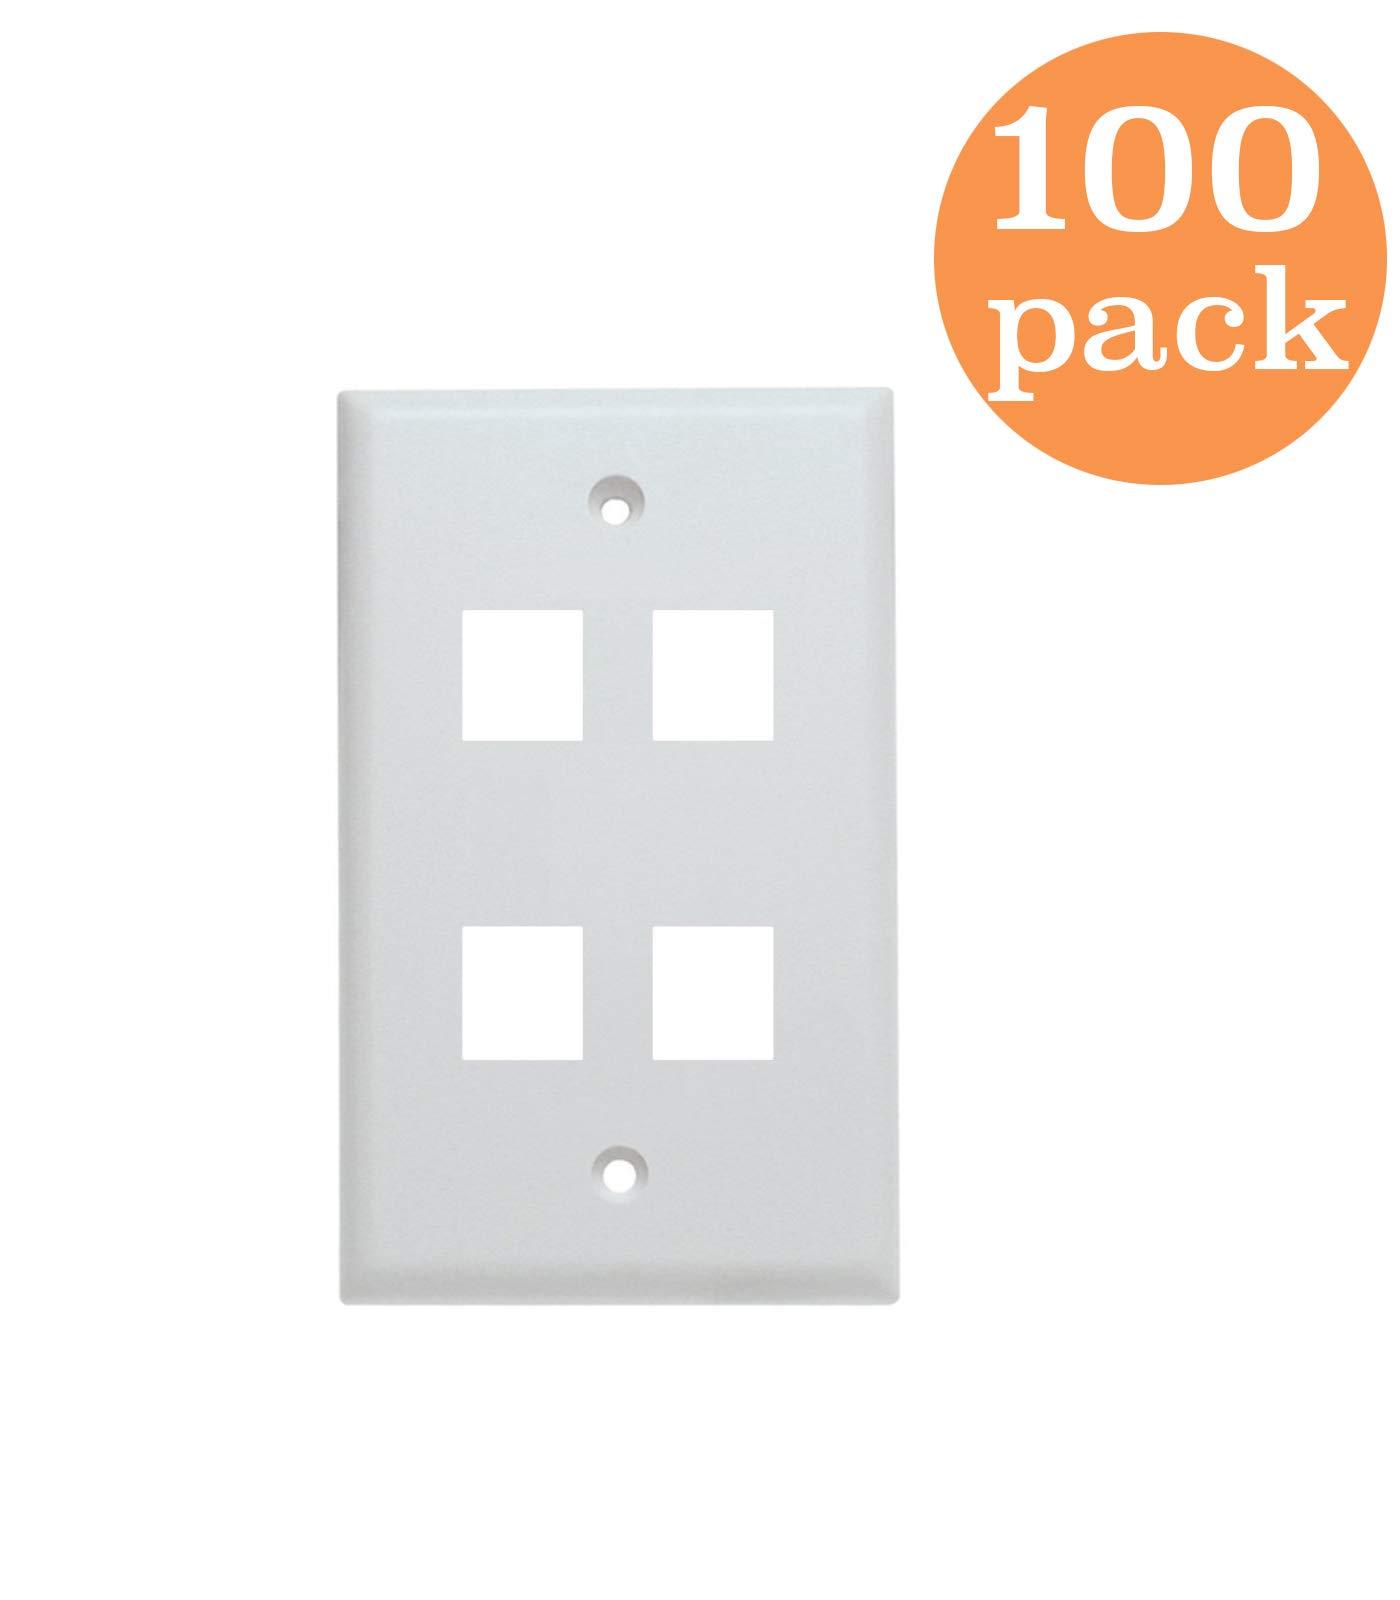 Tricom White Single Gang Cat5e / Cat6 Keystone Wall Plate (100 Pack, 4 Port)